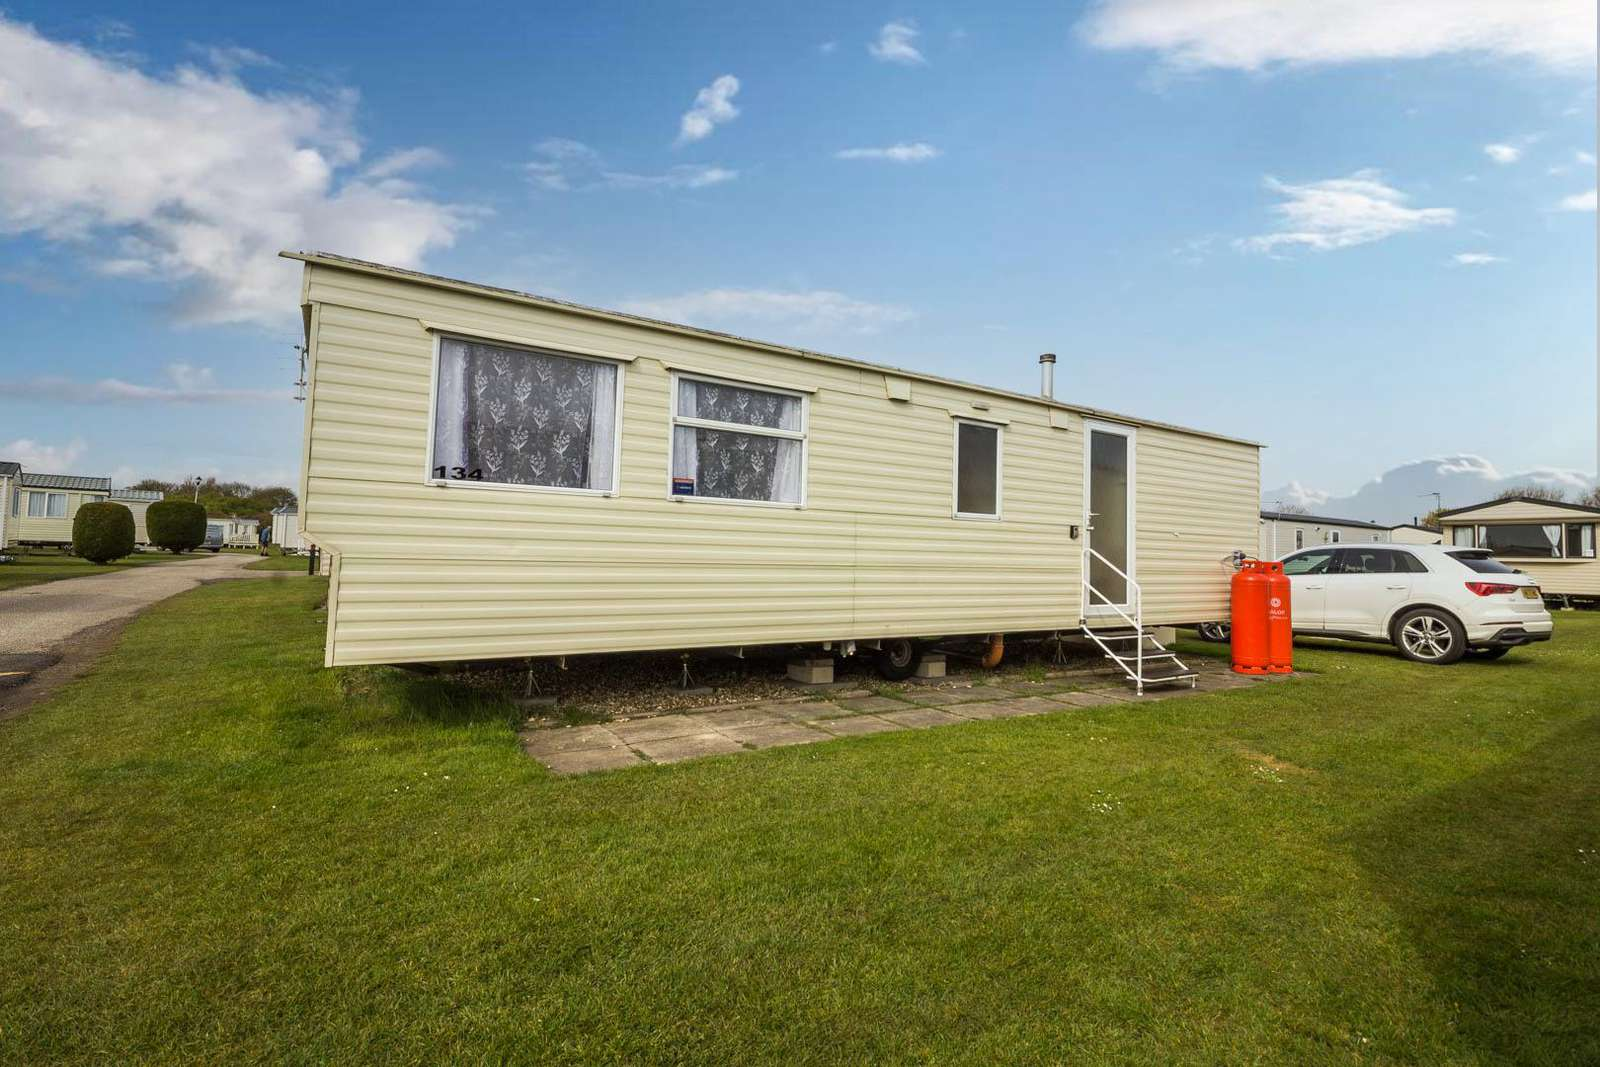 35134S – Sunnydale, 2 bed, 6 berth caravan. Emerald rated. - property